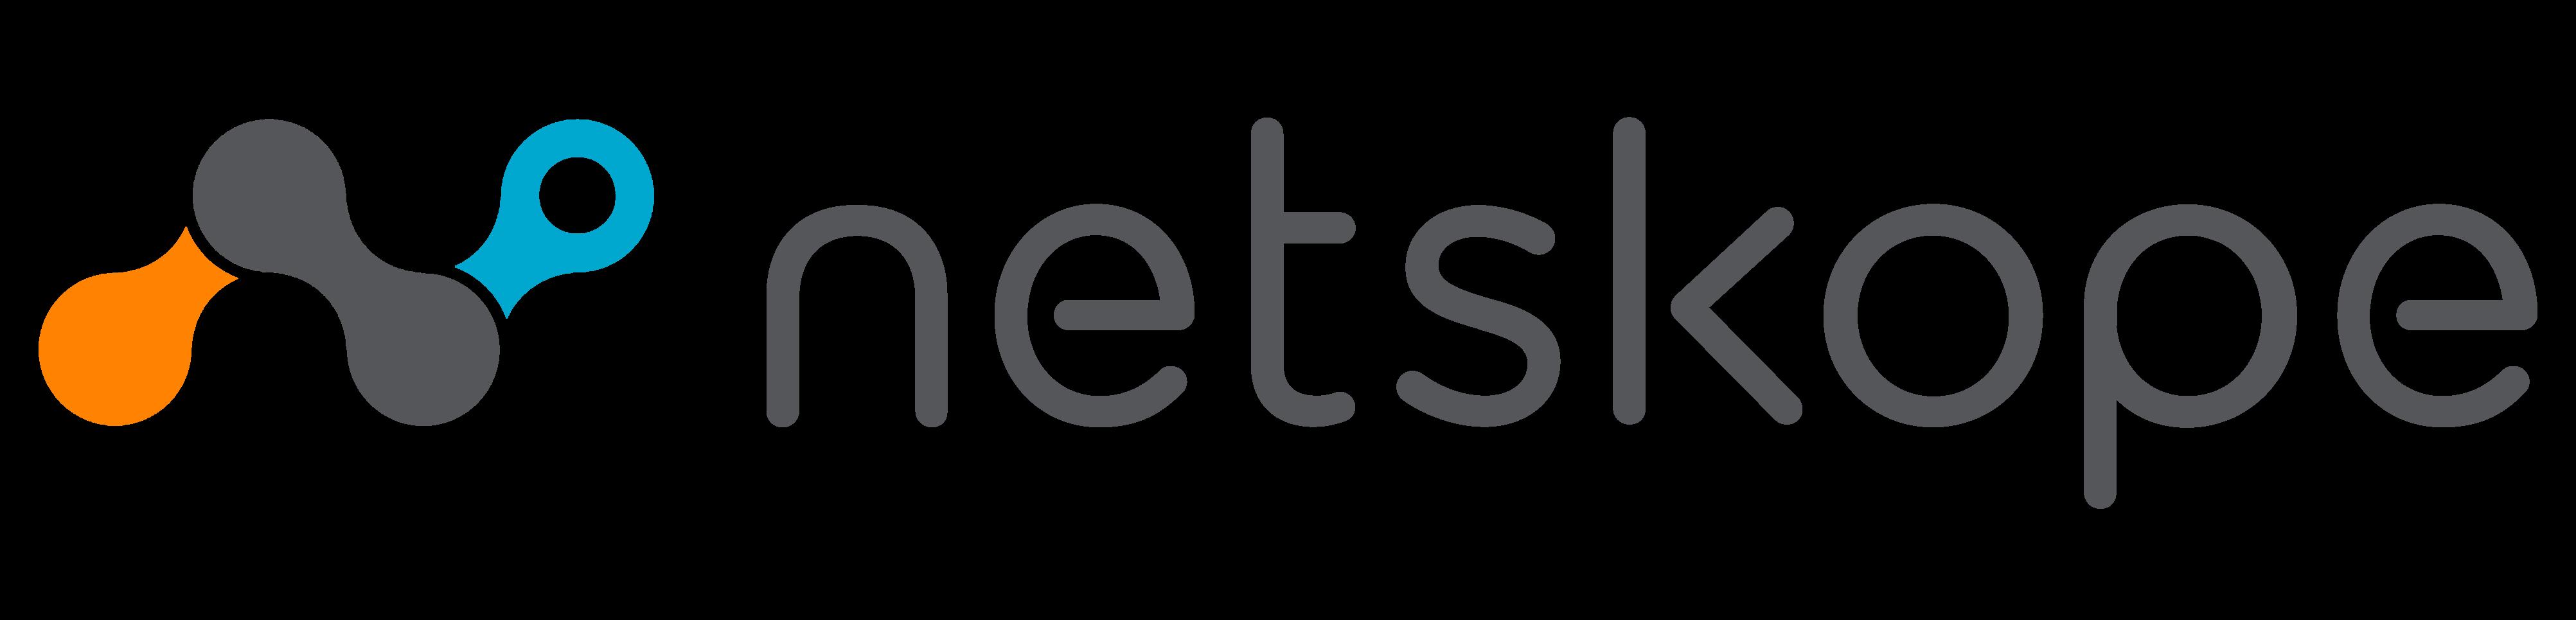 Netskope CASB logo